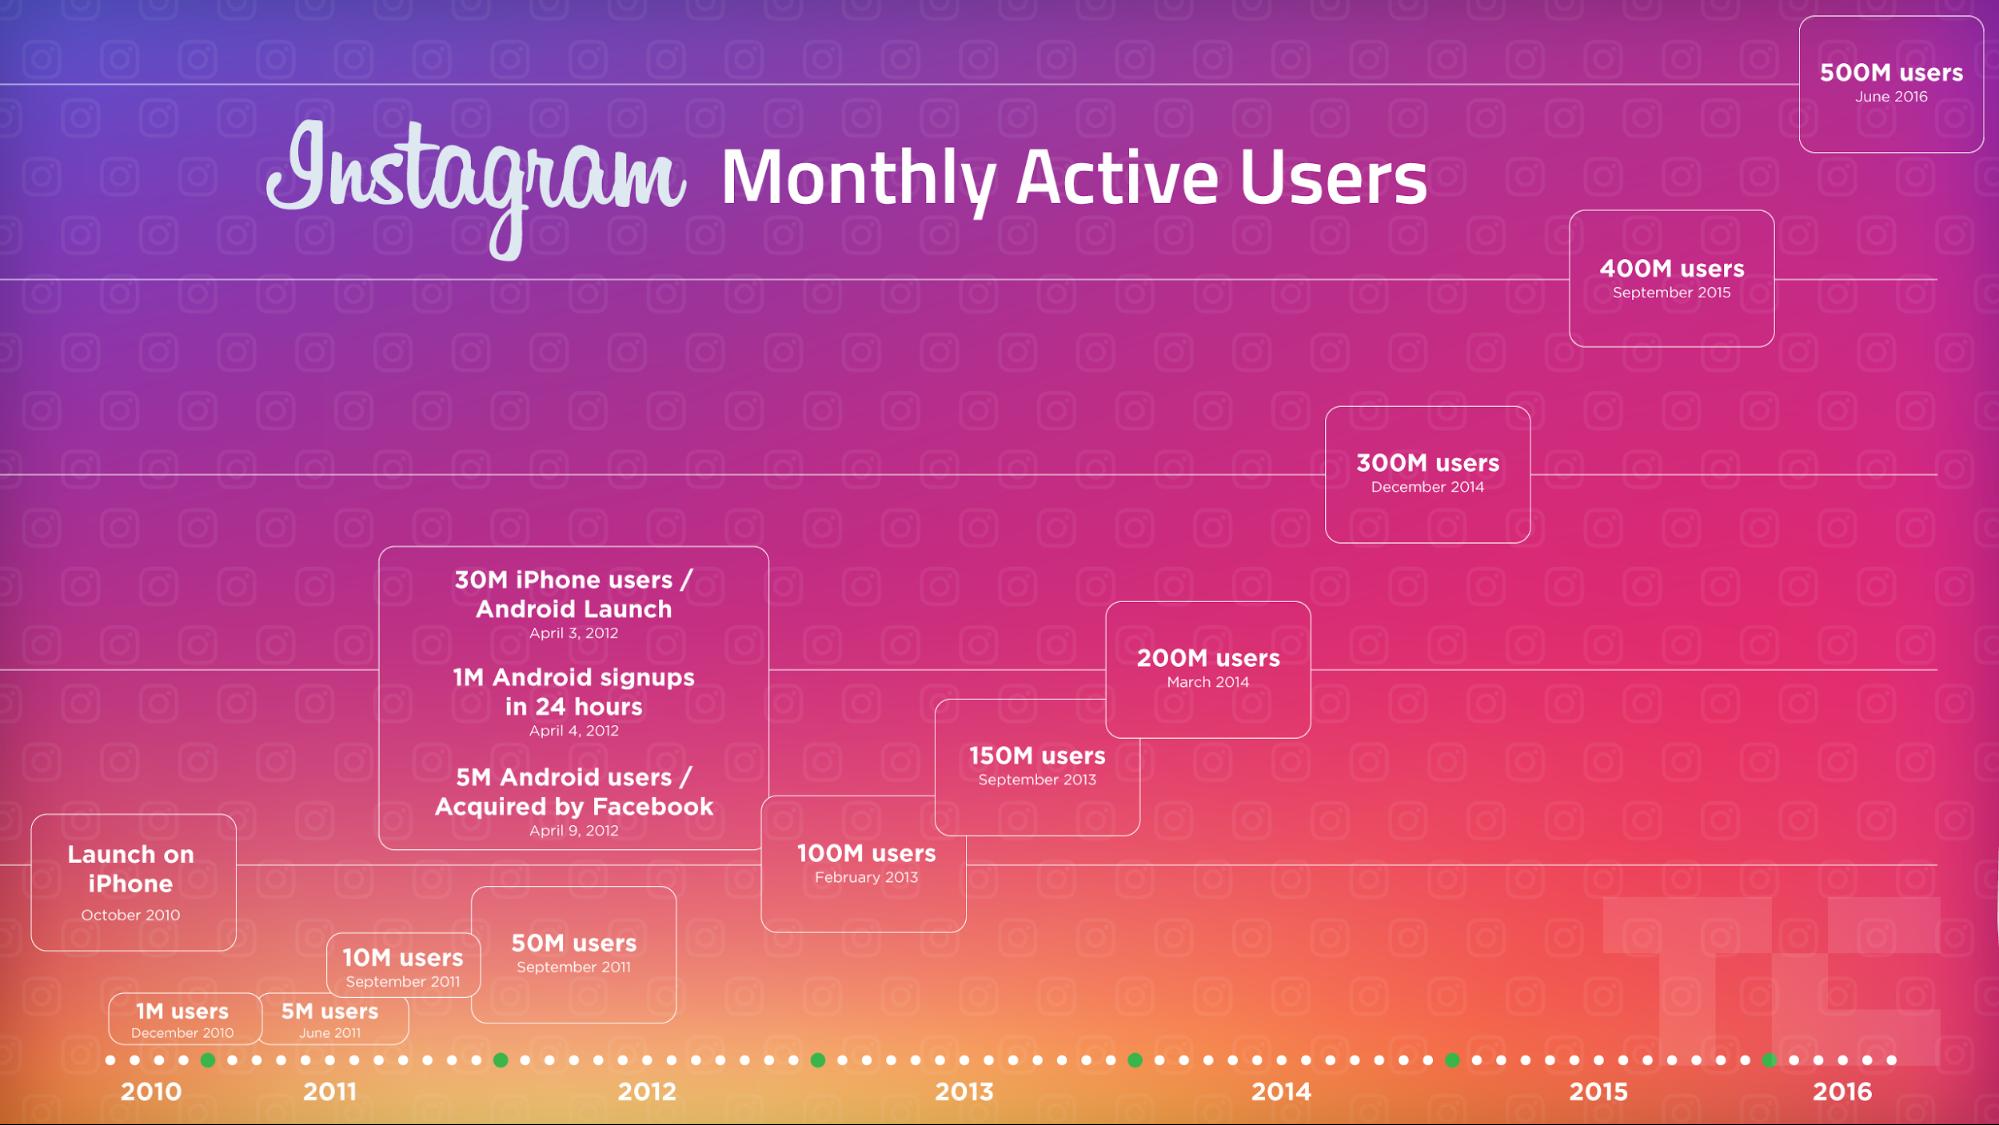 Instagram monthly active users statistics